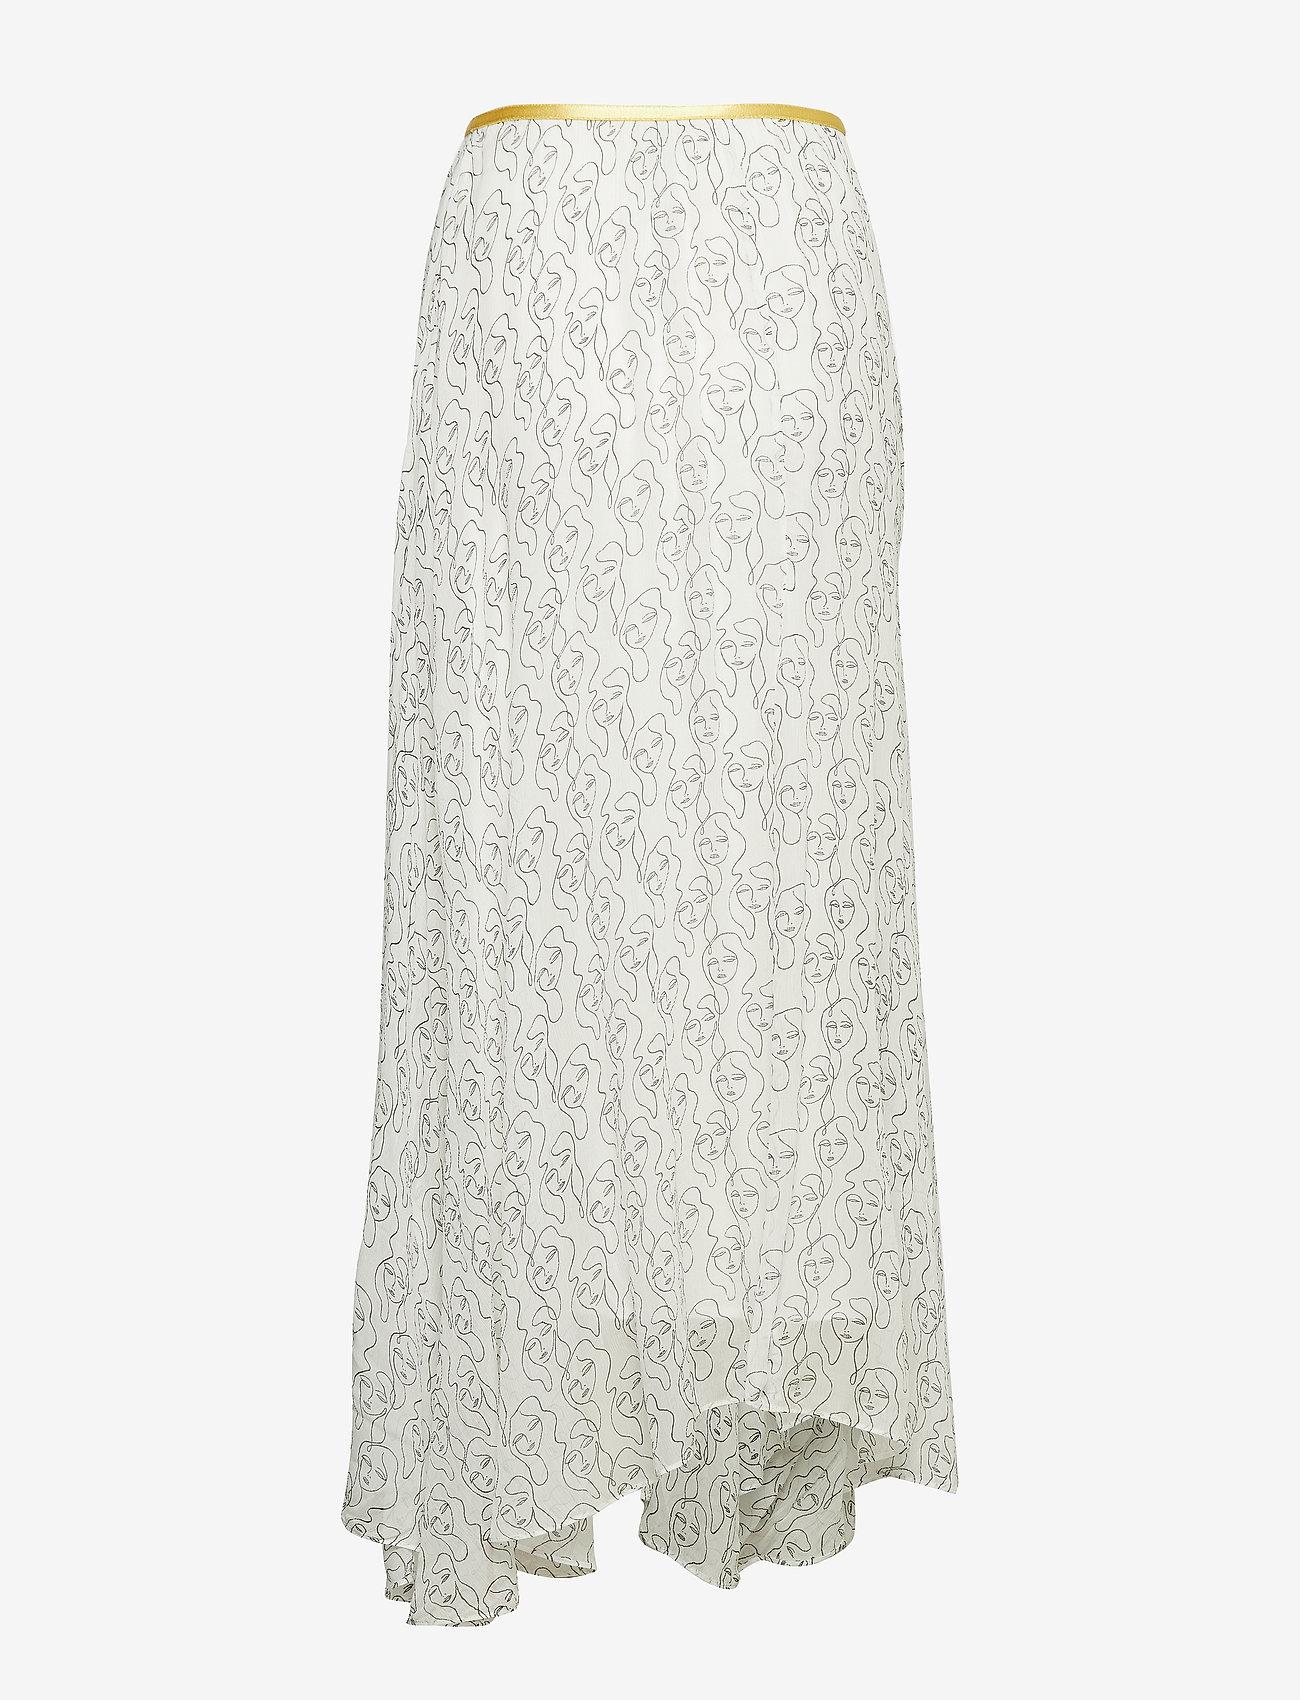 Ski1011s91 (Soft White) (1799.50 kr) - By Malene Birger